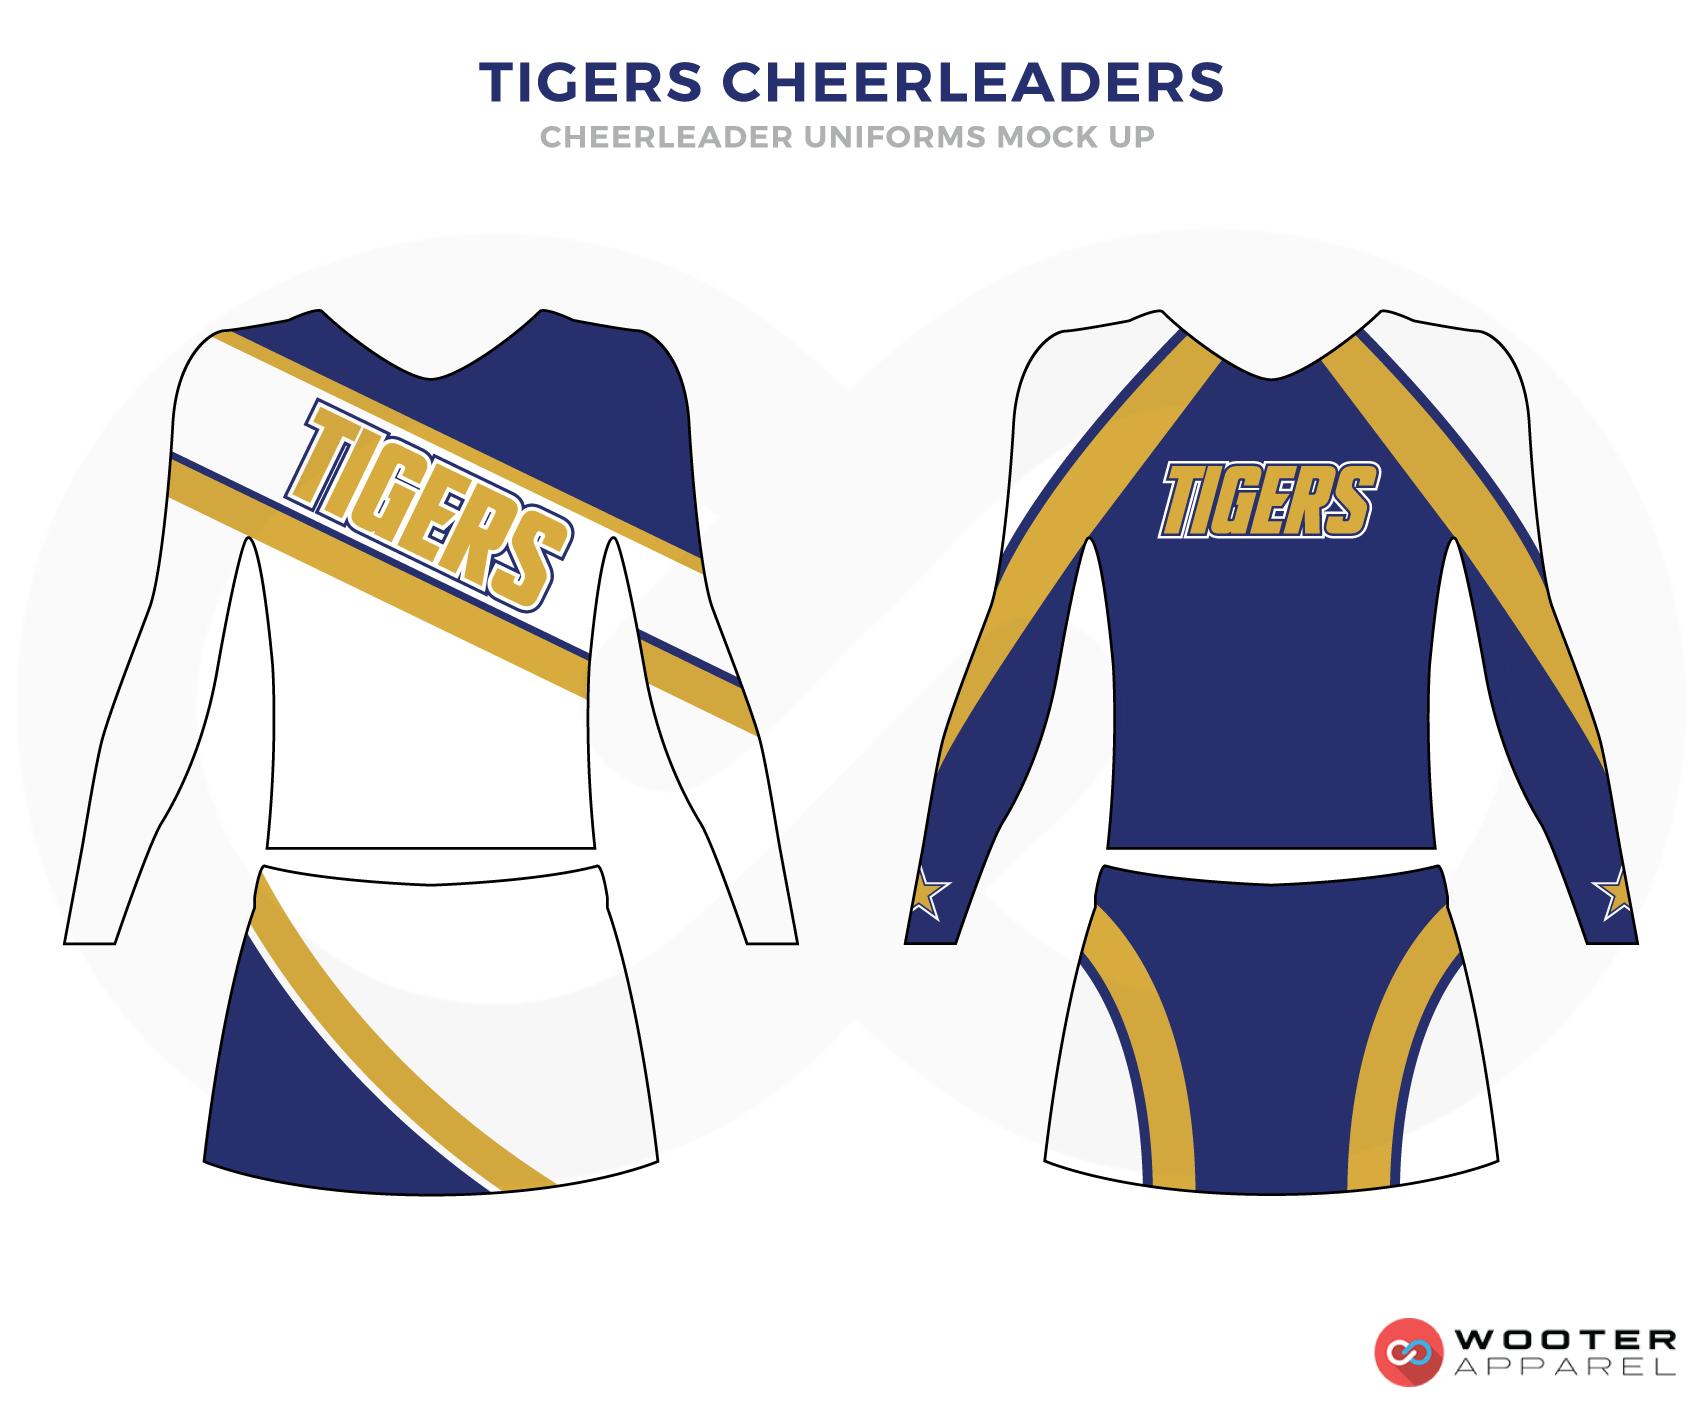 TIGERS CHEERLEADERS blue white yellow cheerleading uniforms, top, and skirt